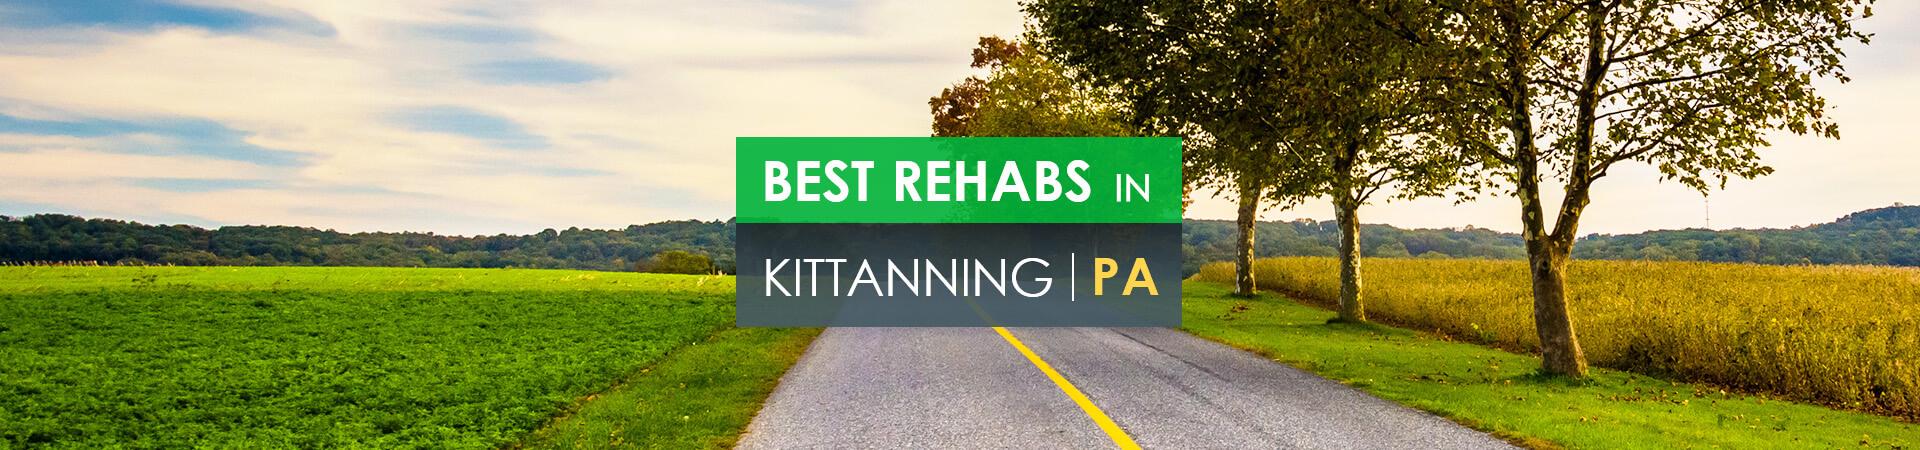 Best rehabs in Kittanning, PA